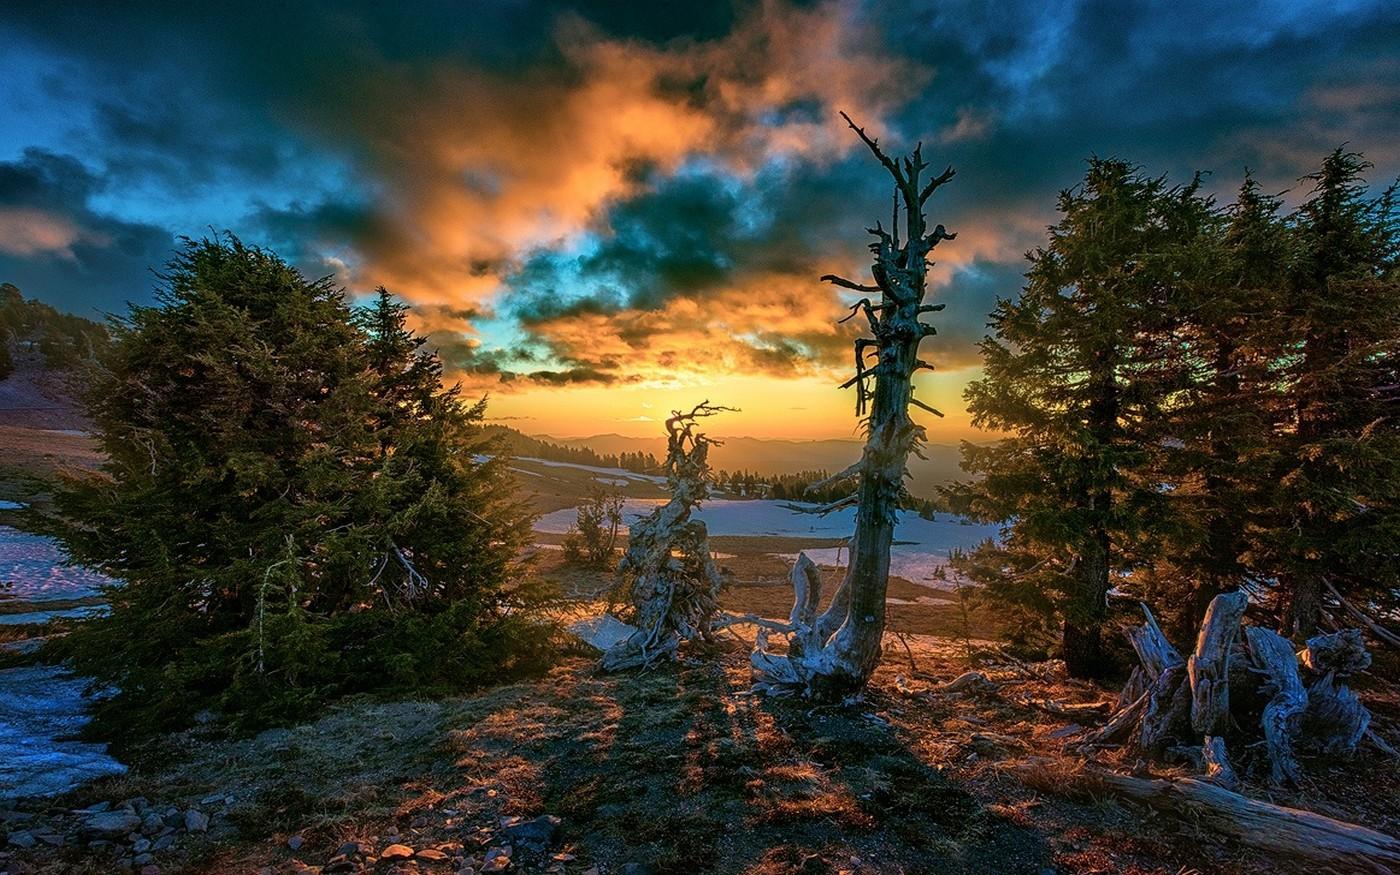 Simple Wallpaper Minecraft Autumn - 1400x875_px_clouds_Fall_Hill_landscape_nature_Oregon_snow-701437  2018_1009794.jpg!d